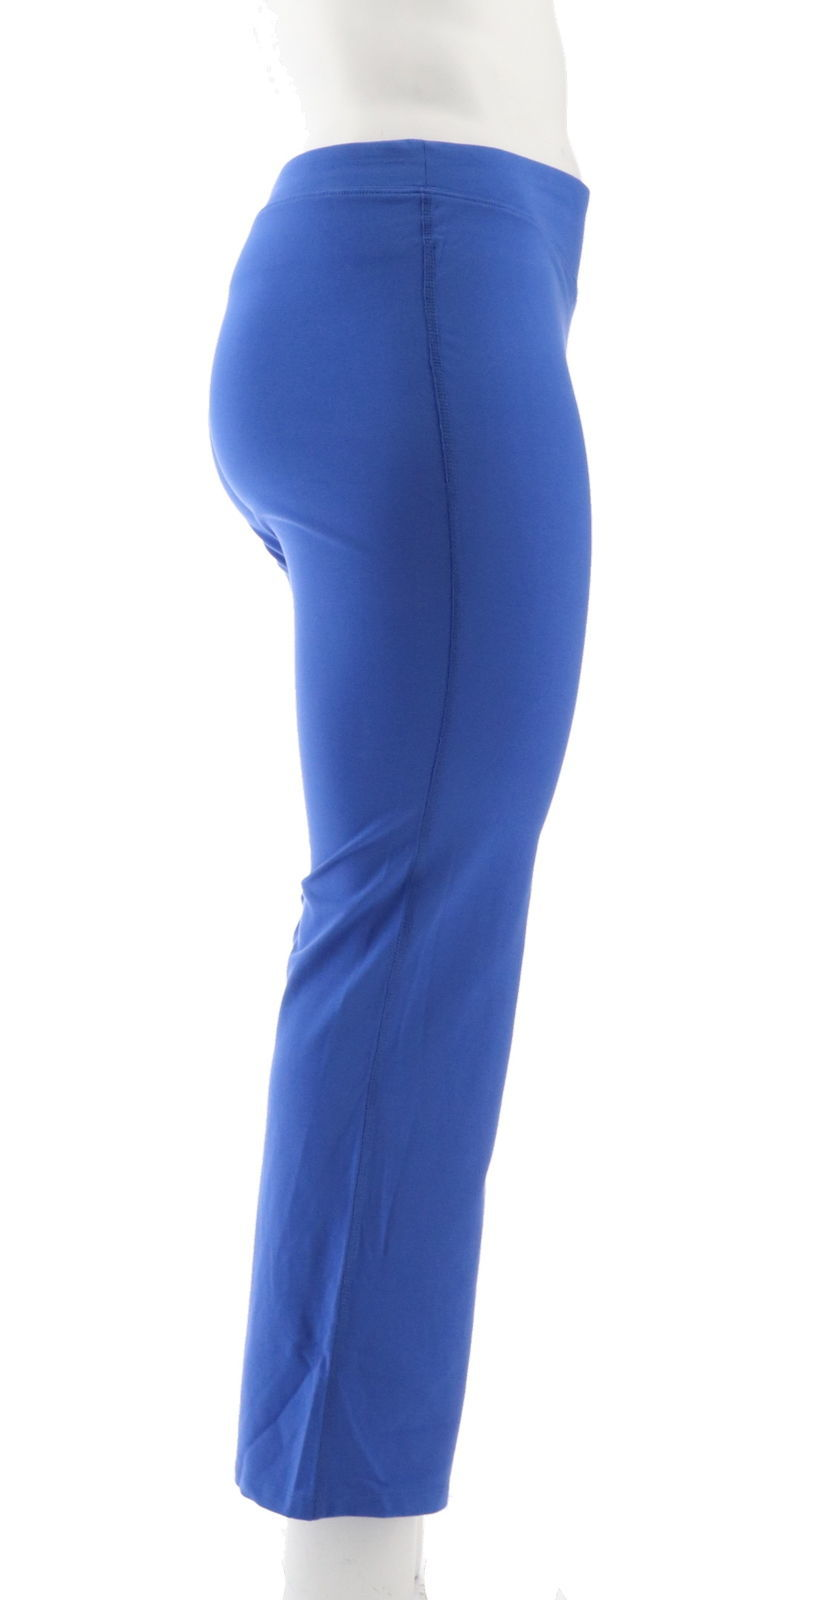 Denim & Co Duo-Stretch Slightly Boot Cut Pants Vibrant Blue L NEW A261851